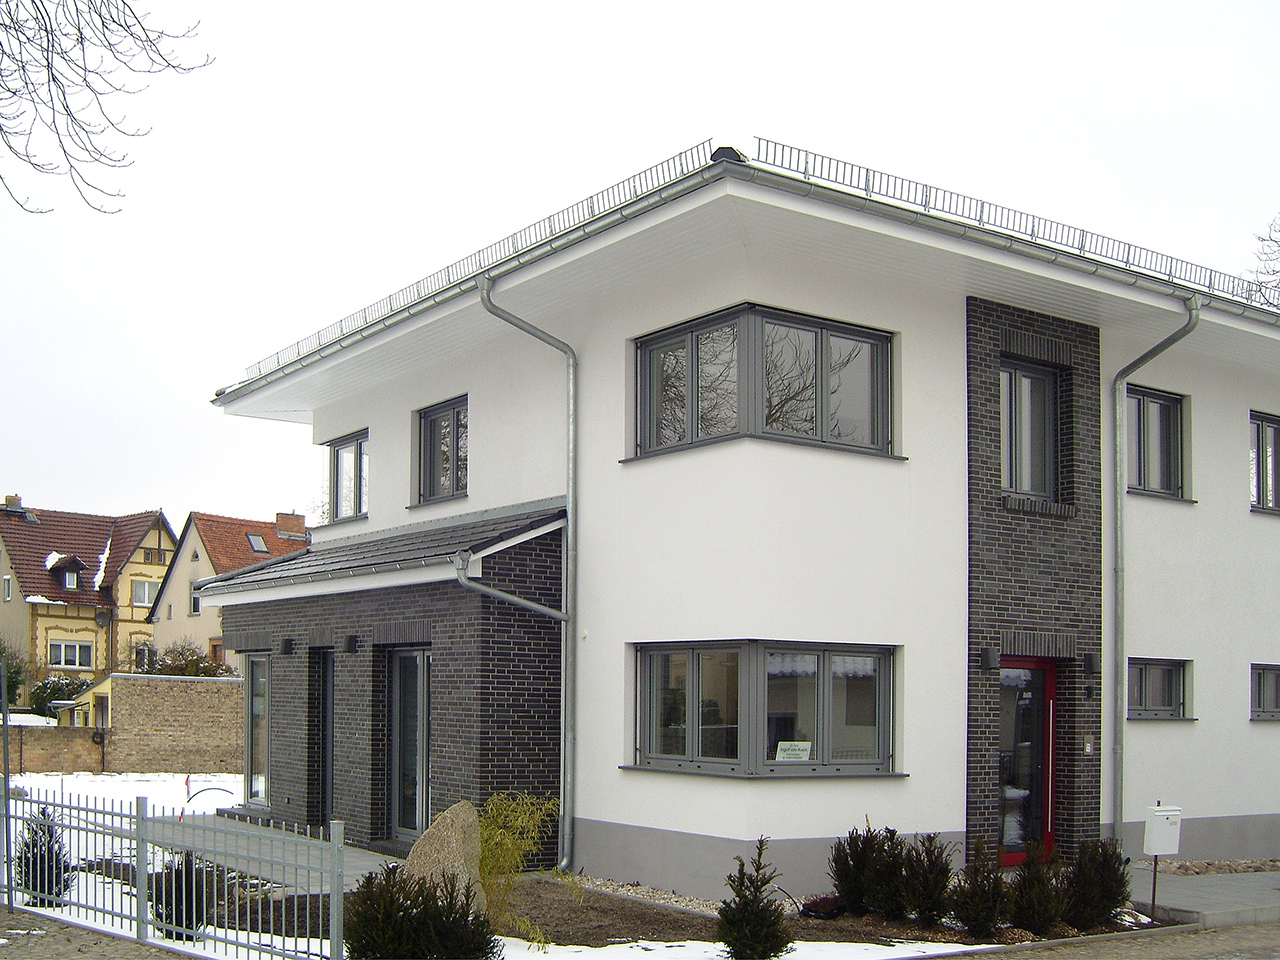 Stadtvilla klinker dunkel  Caputh Praxisgebäude - Architekt Uwe Müller Potsdam